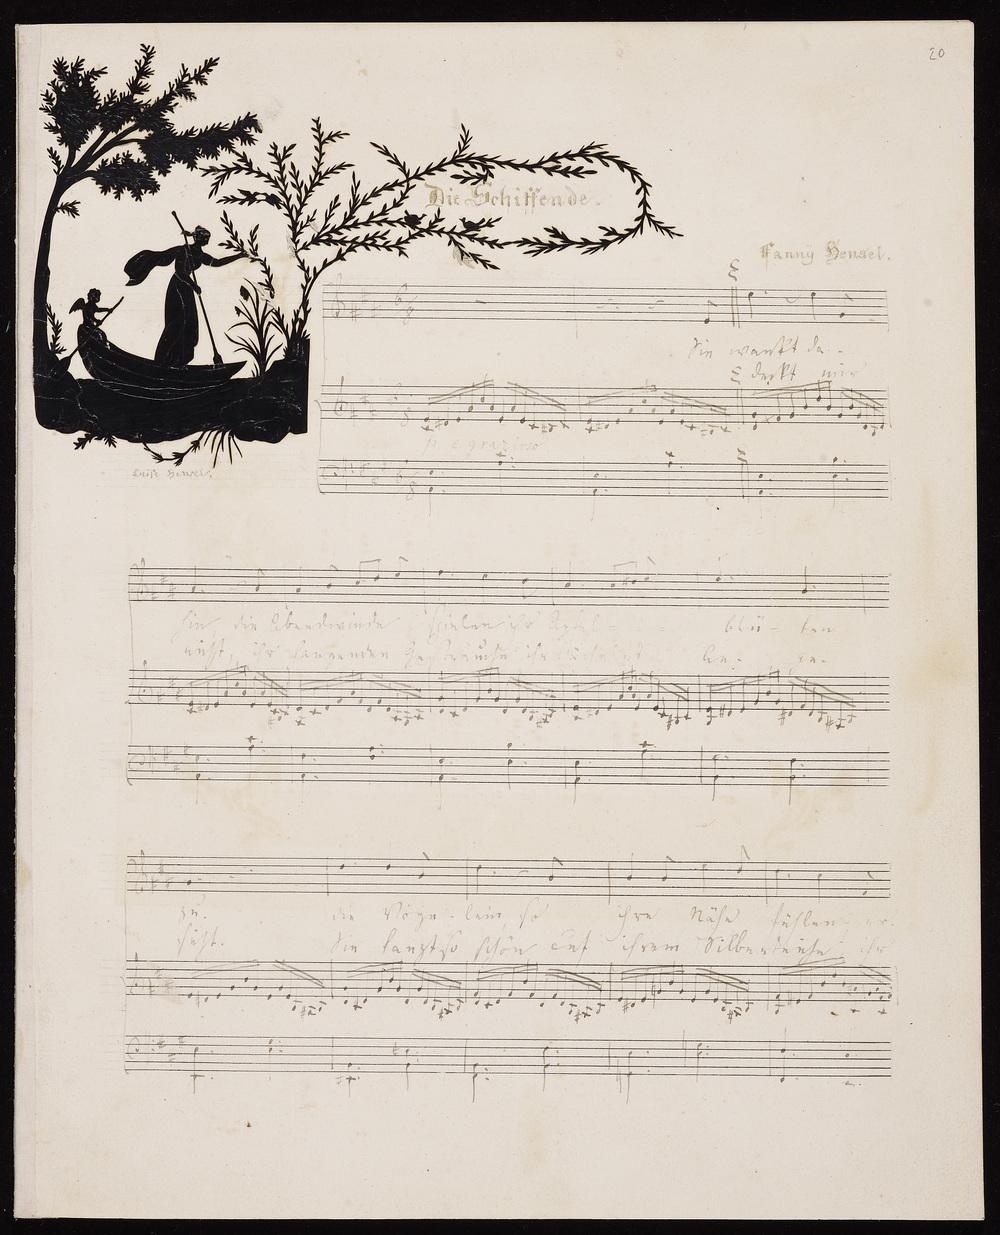 Fanny Hensel, 'Die Schiffende', an autograph fair copy